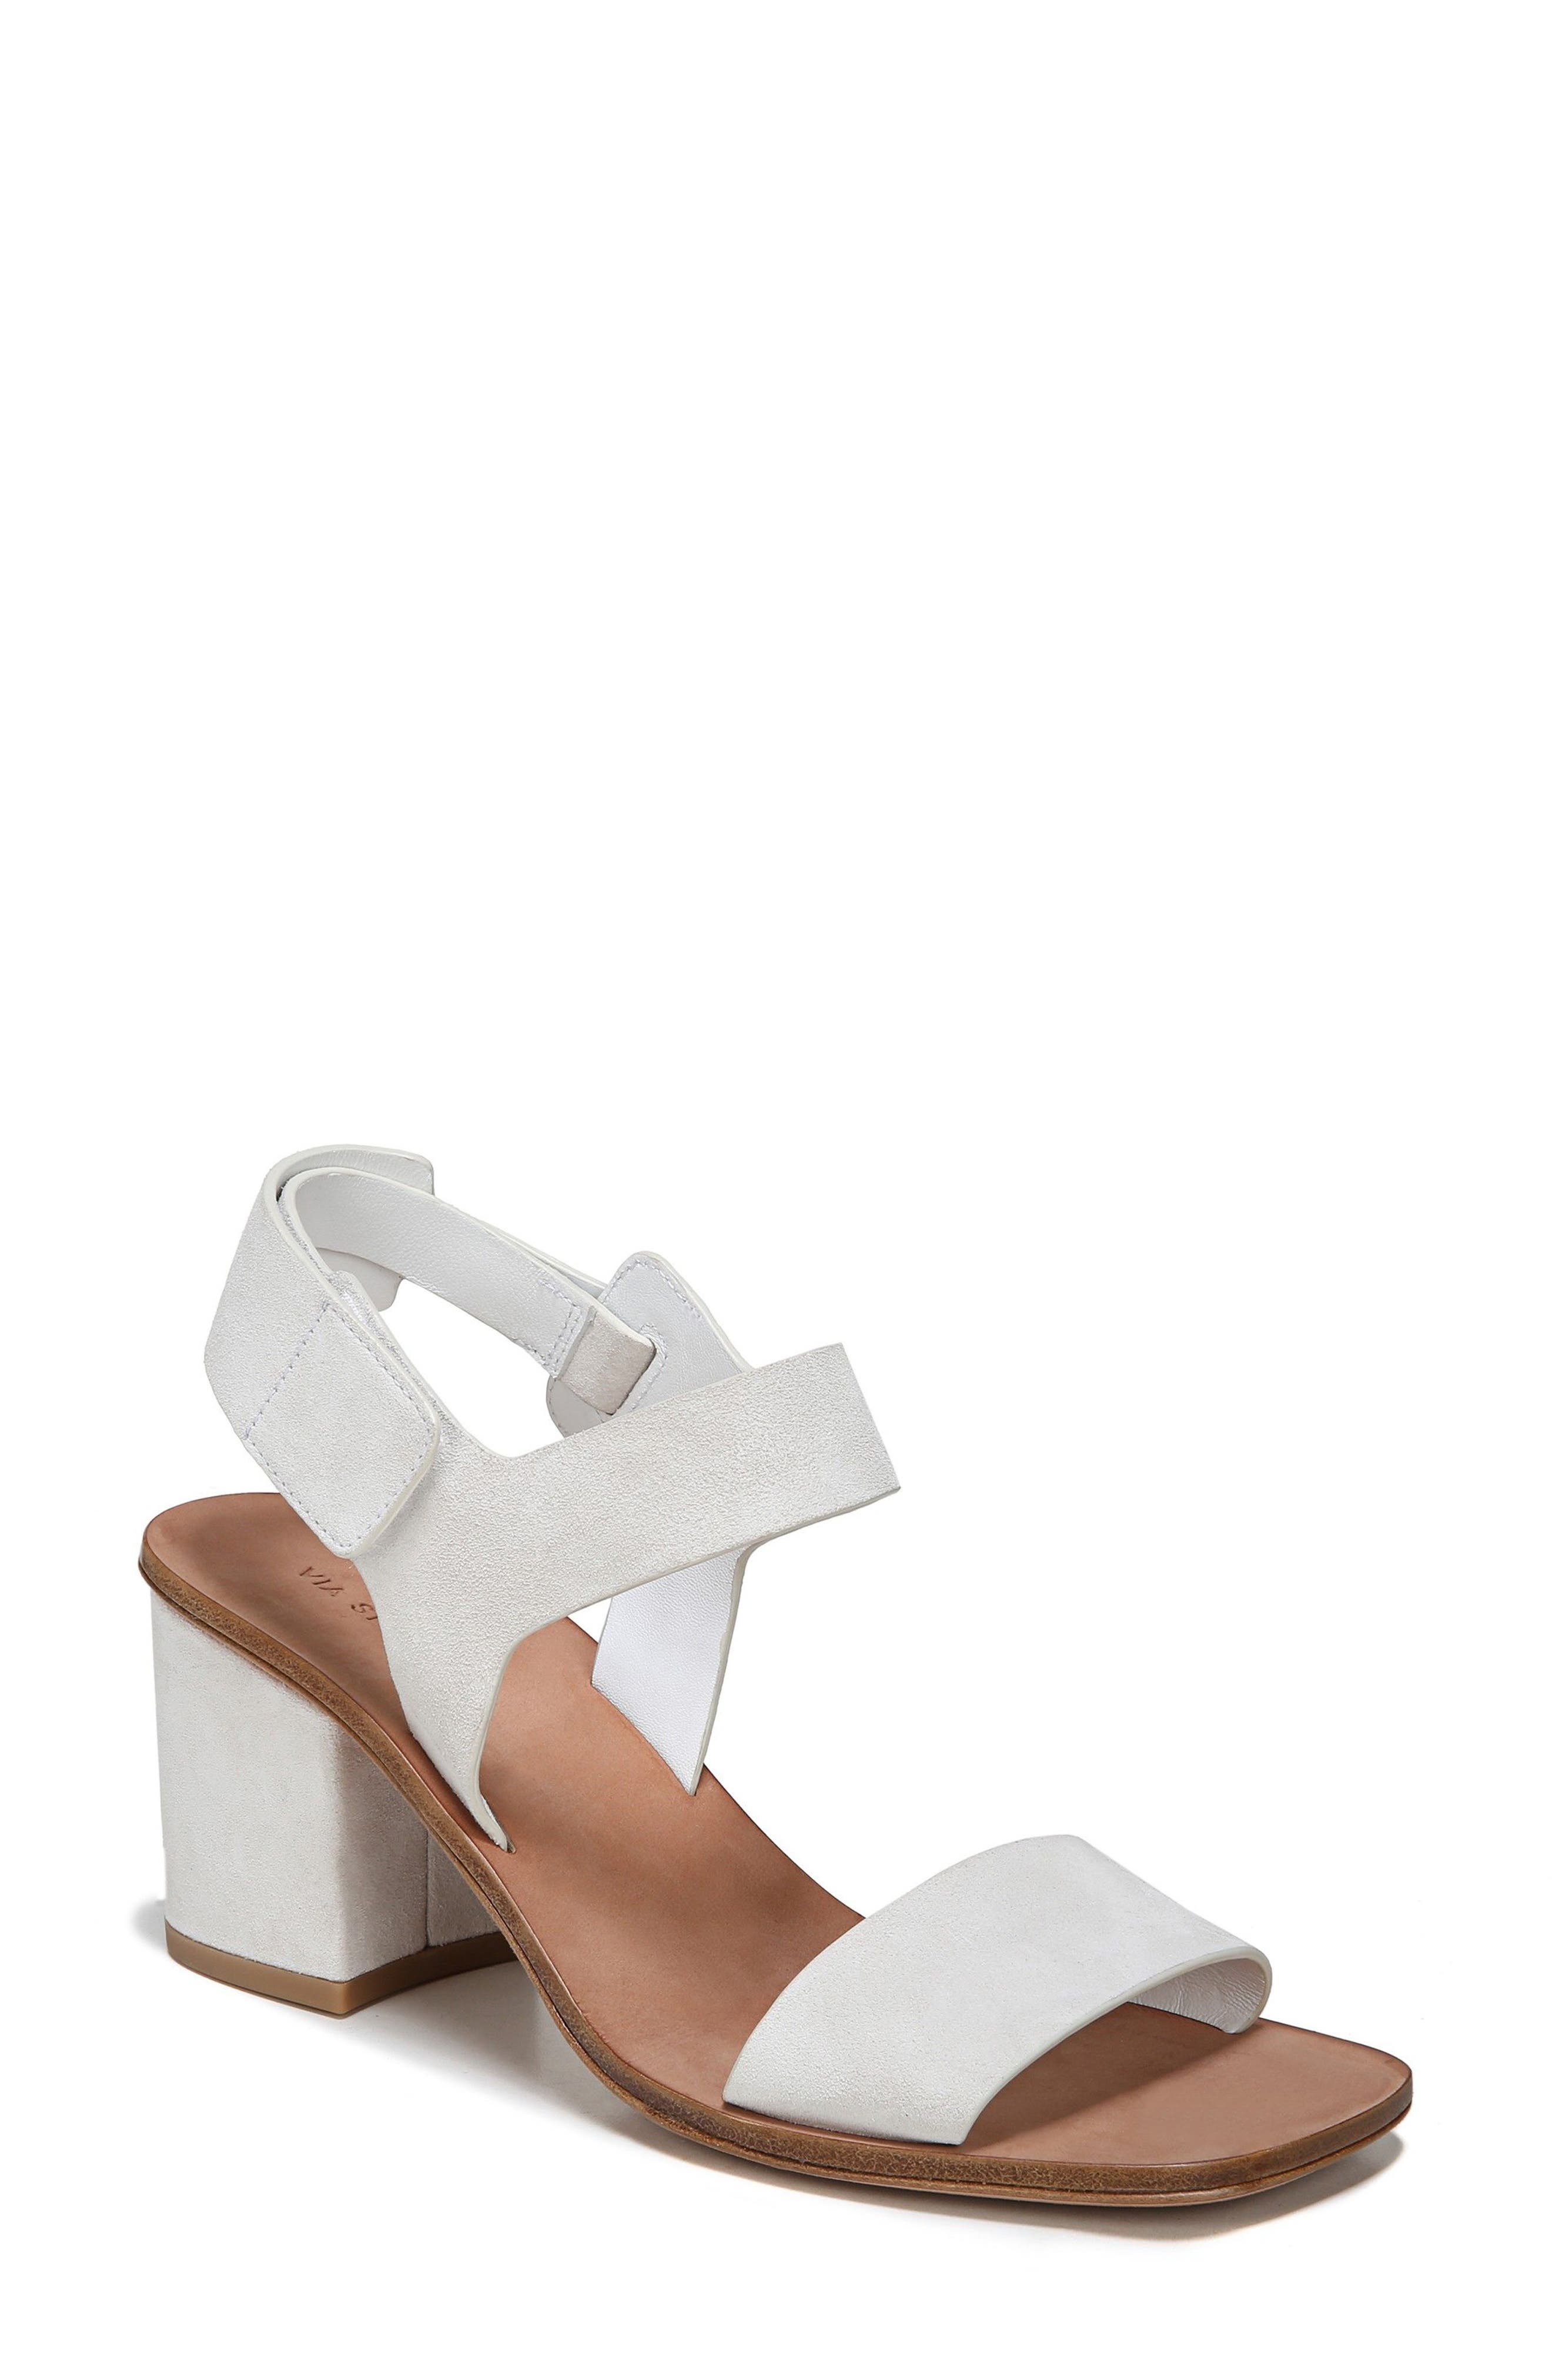 33f4f70af37 Via Spiga Kamille Block Heel Sandal In Bone Suede